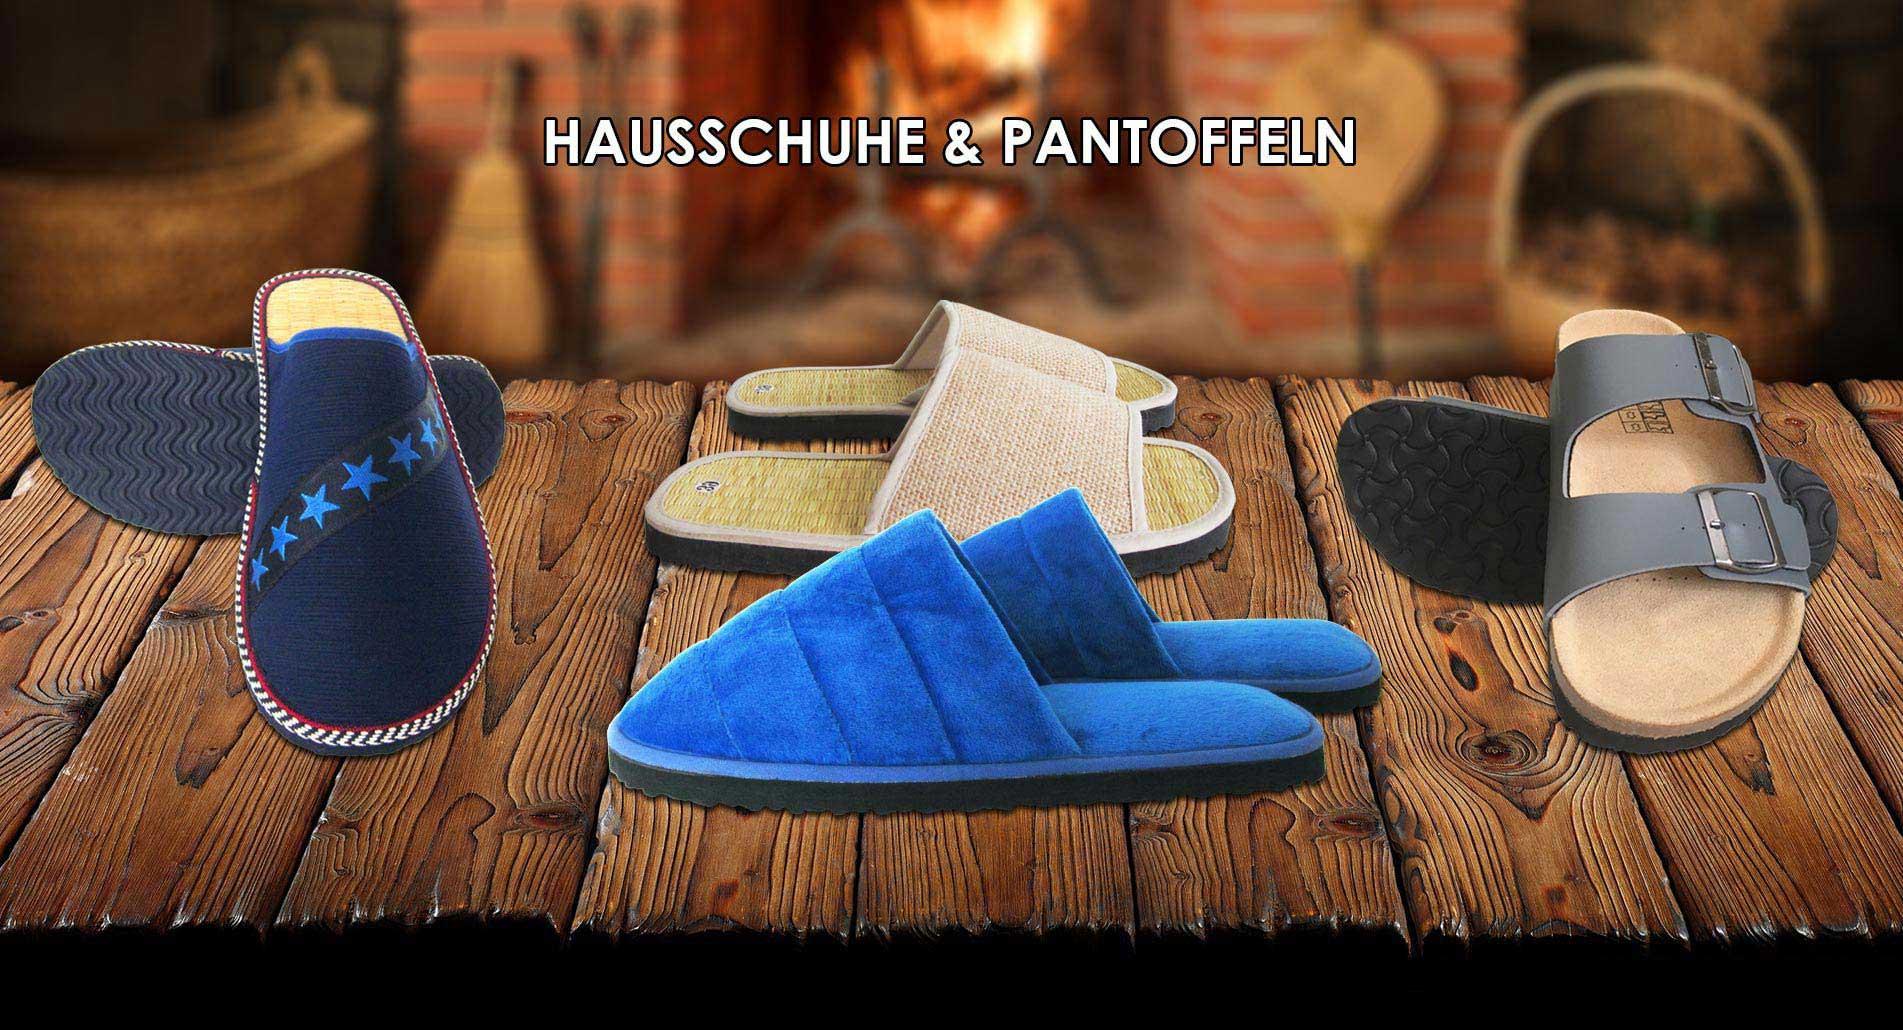 Hausschuhe, Pantoffeln und Sandalen